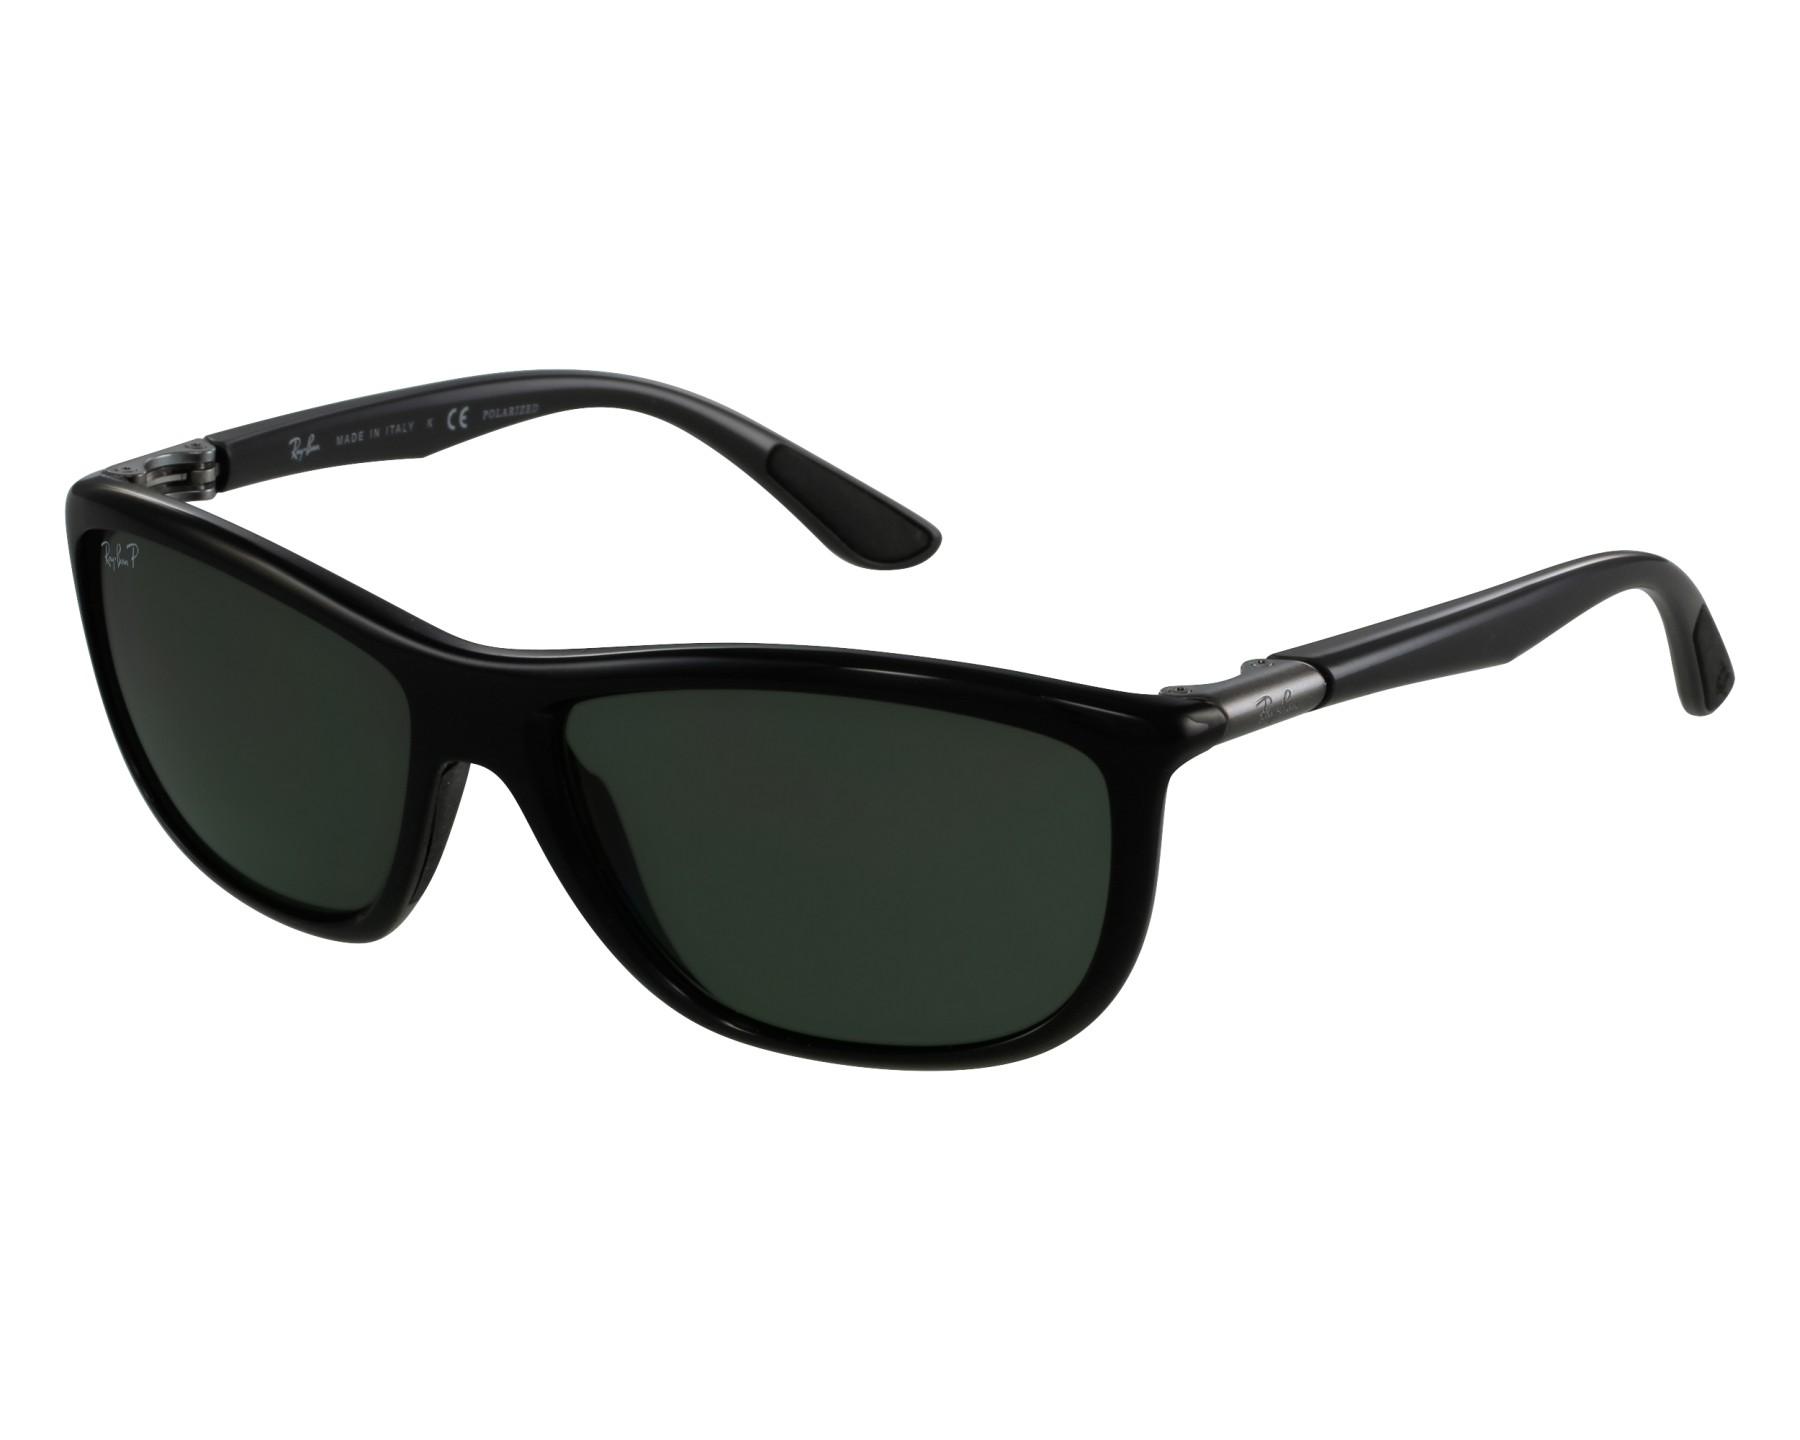 464460a44b0 Sunglasses Ray-Ban RB-8351 6219 9A 60-17 Black Gun front